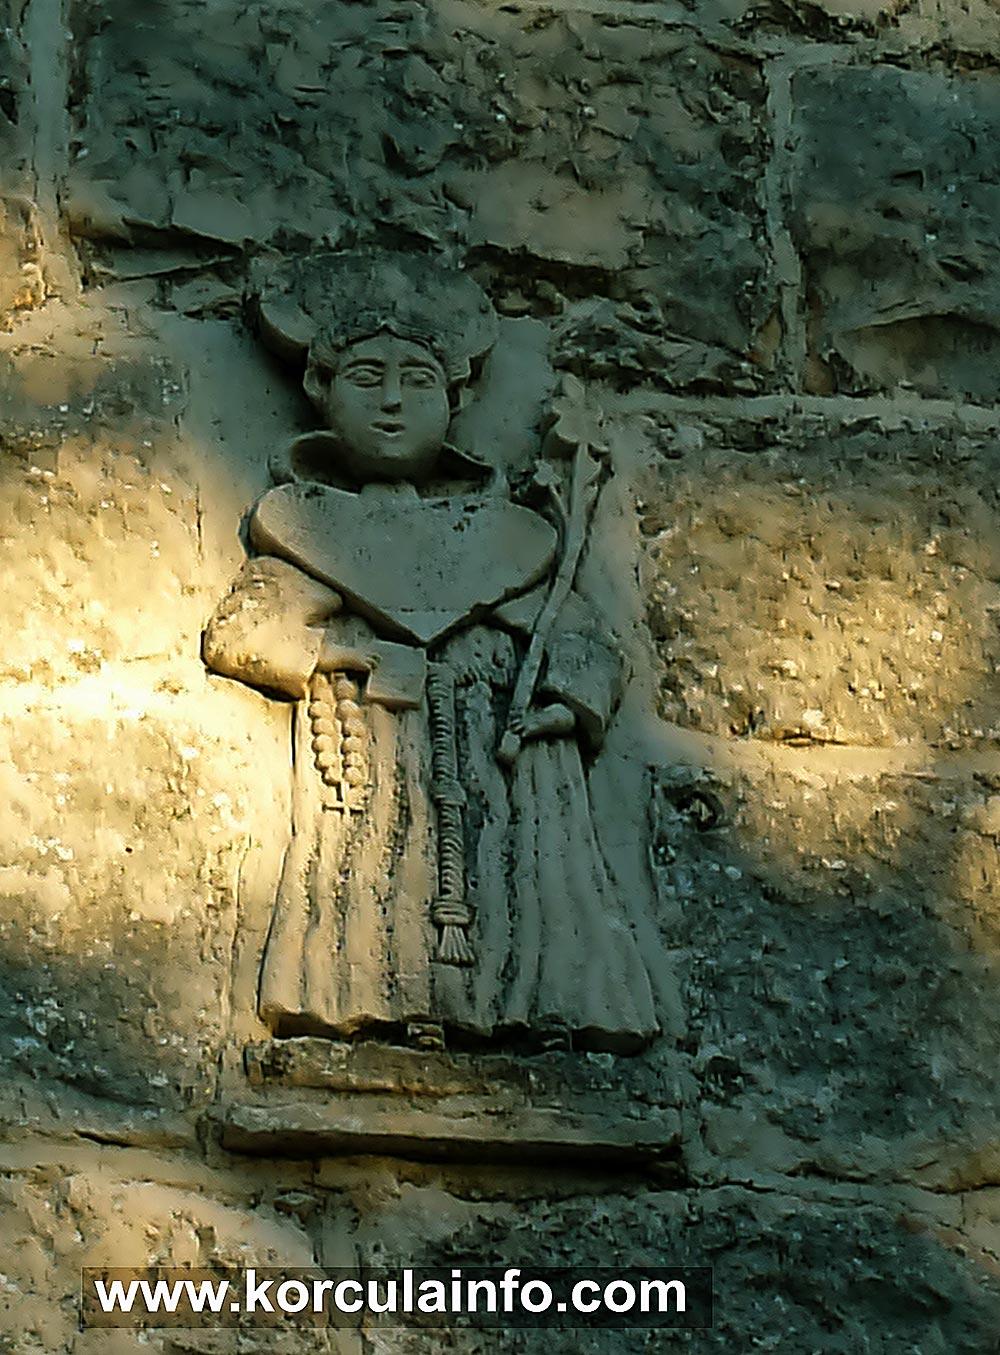 St Antony's relief / plaque on church facade